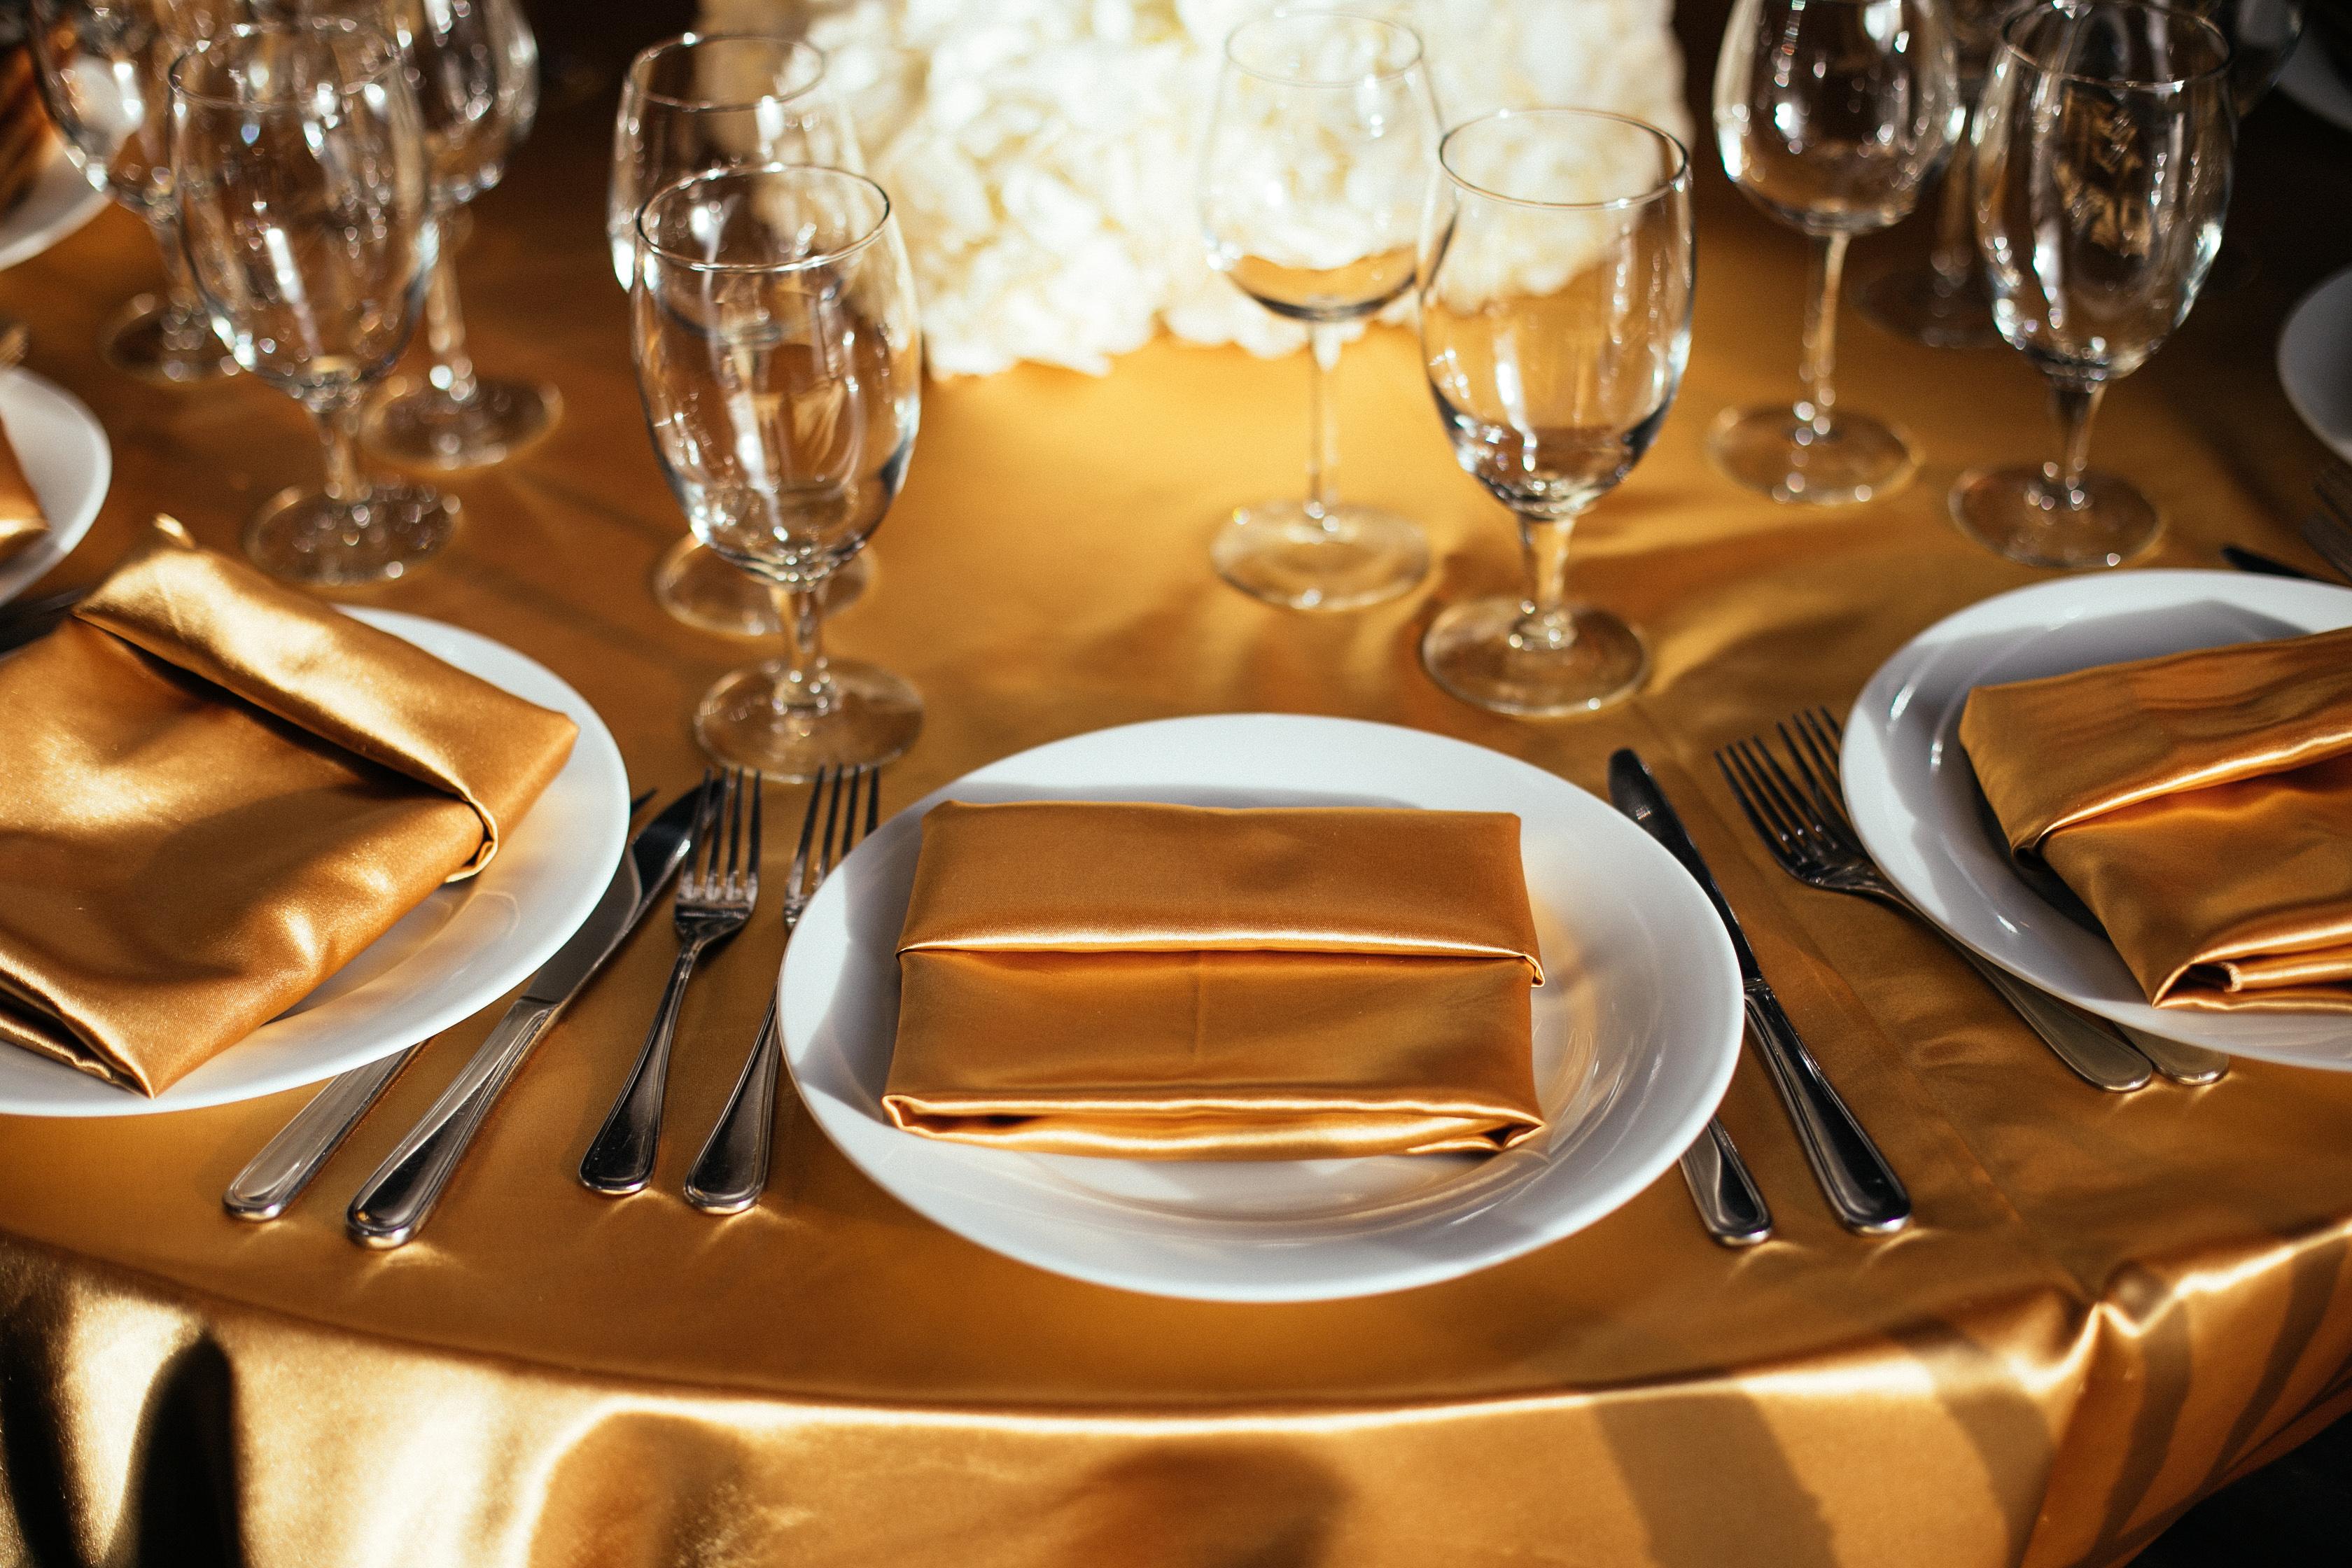 Golden table setting